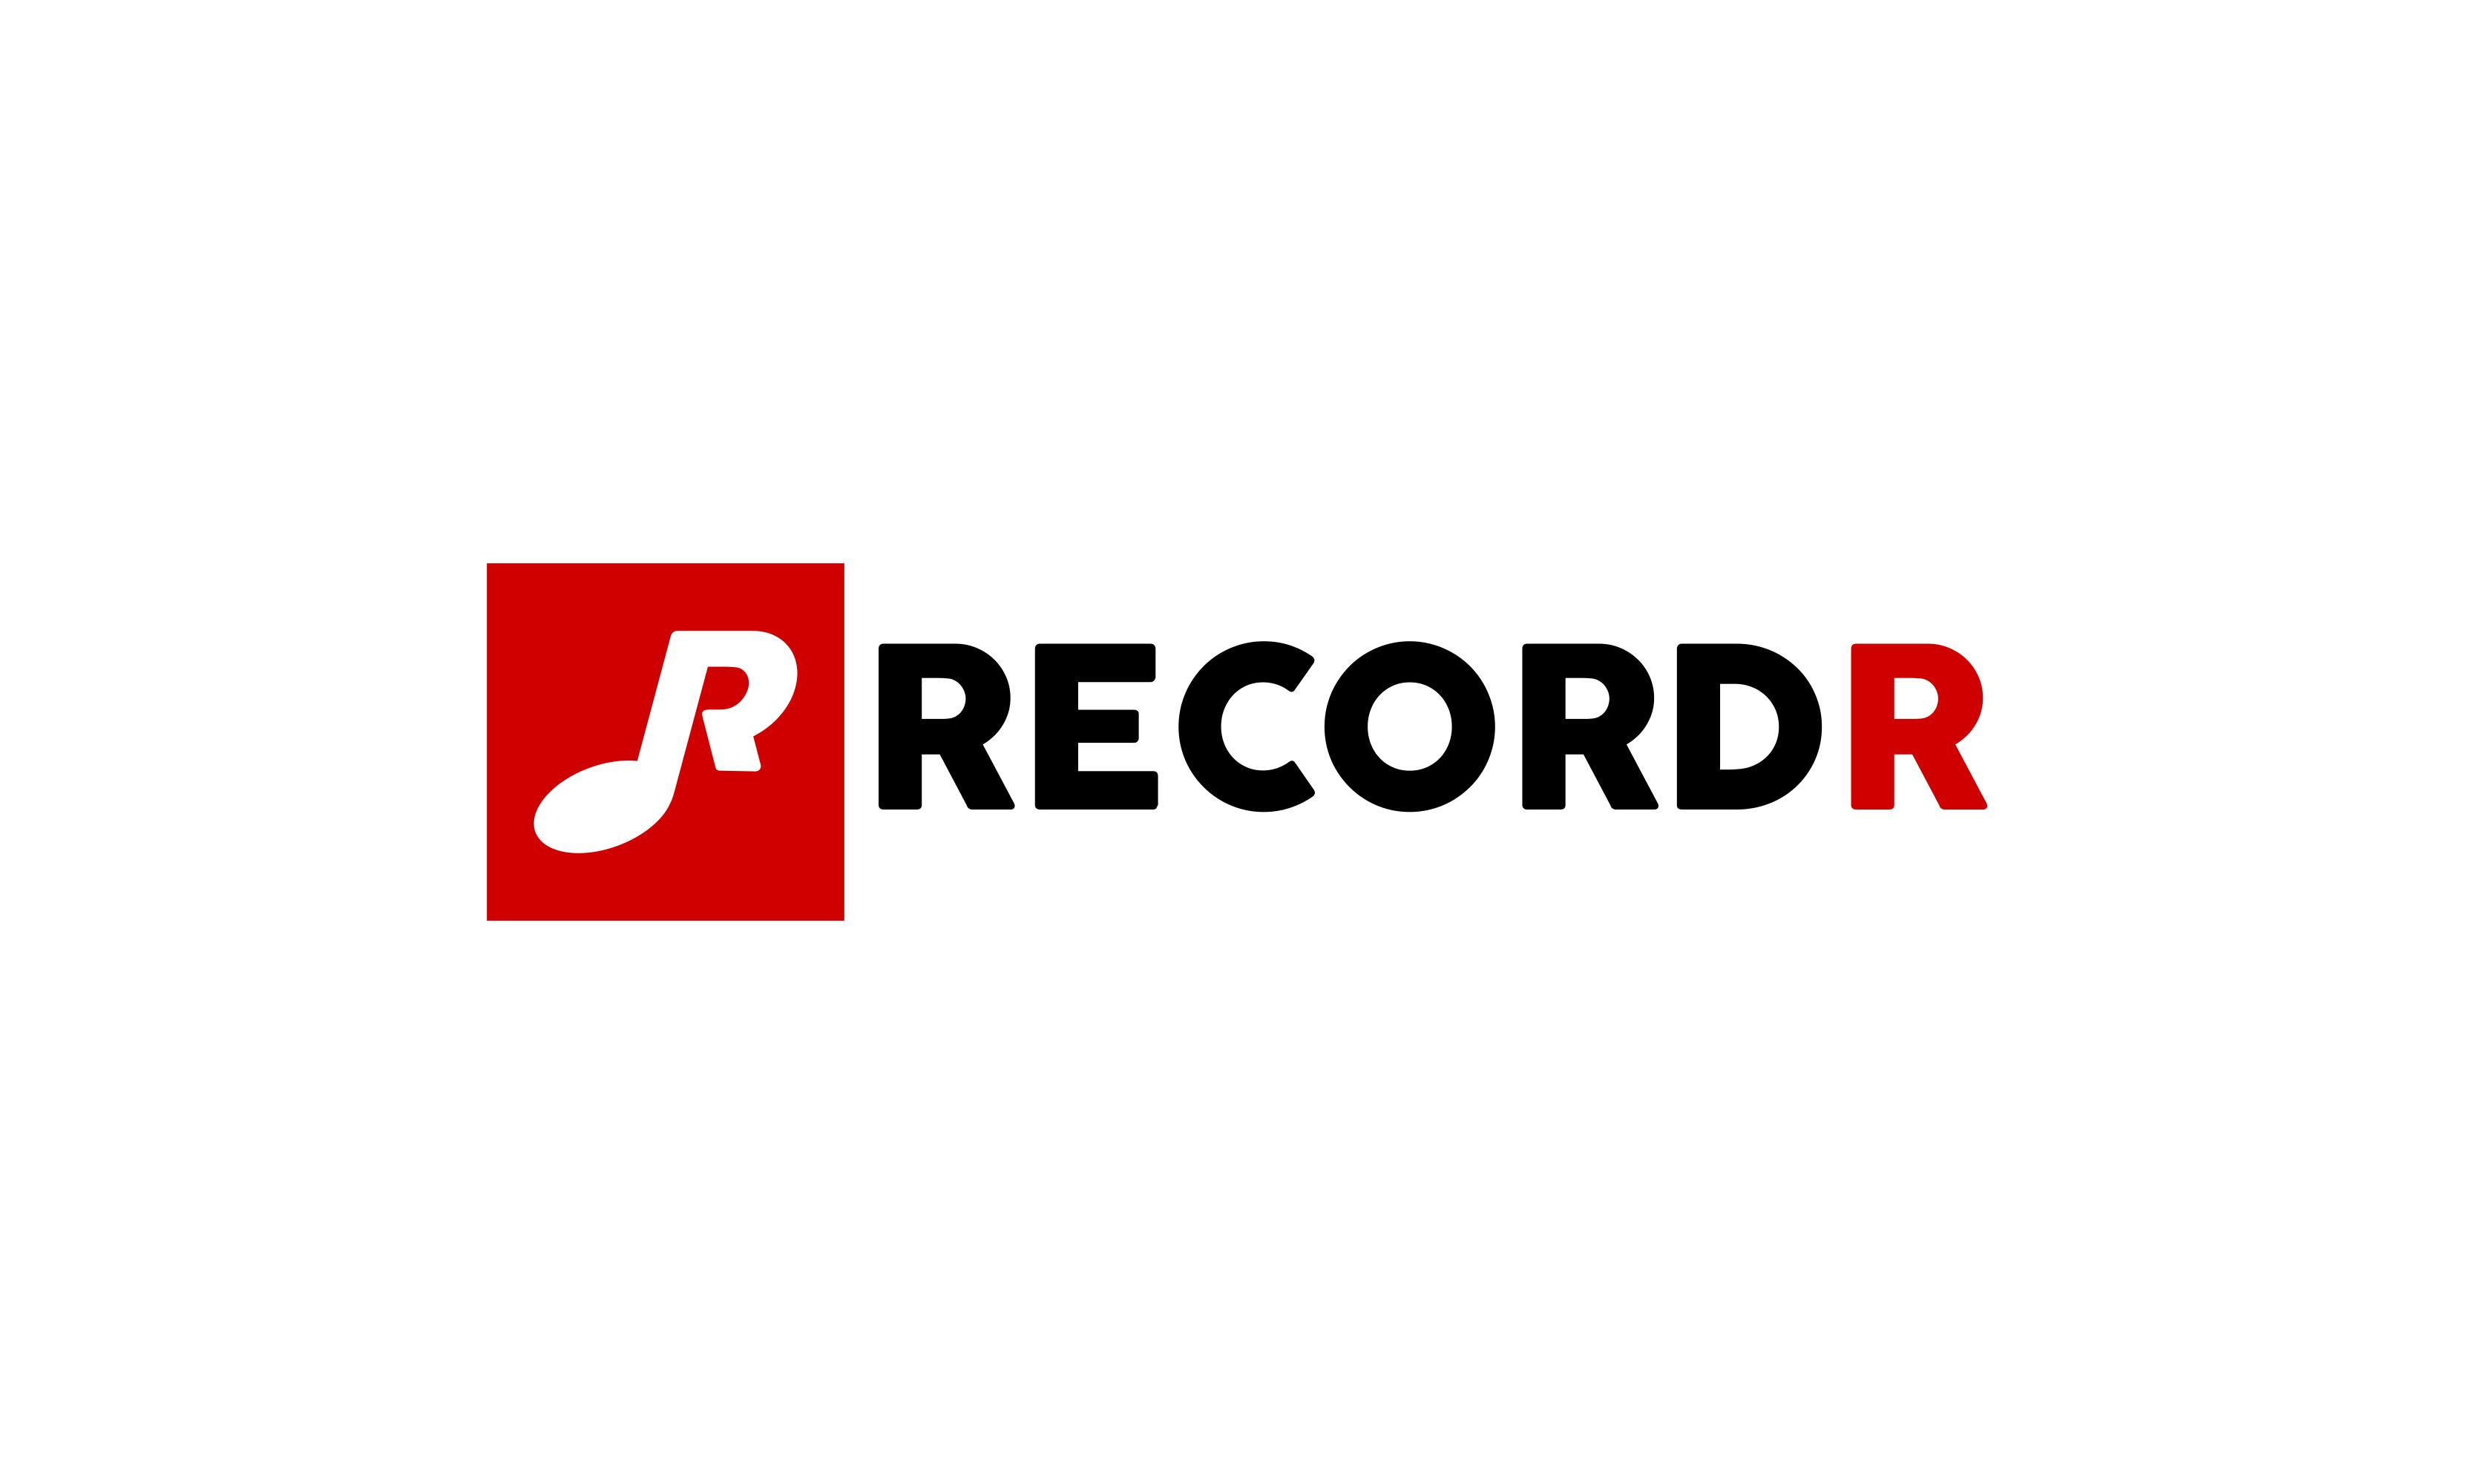 Recordr